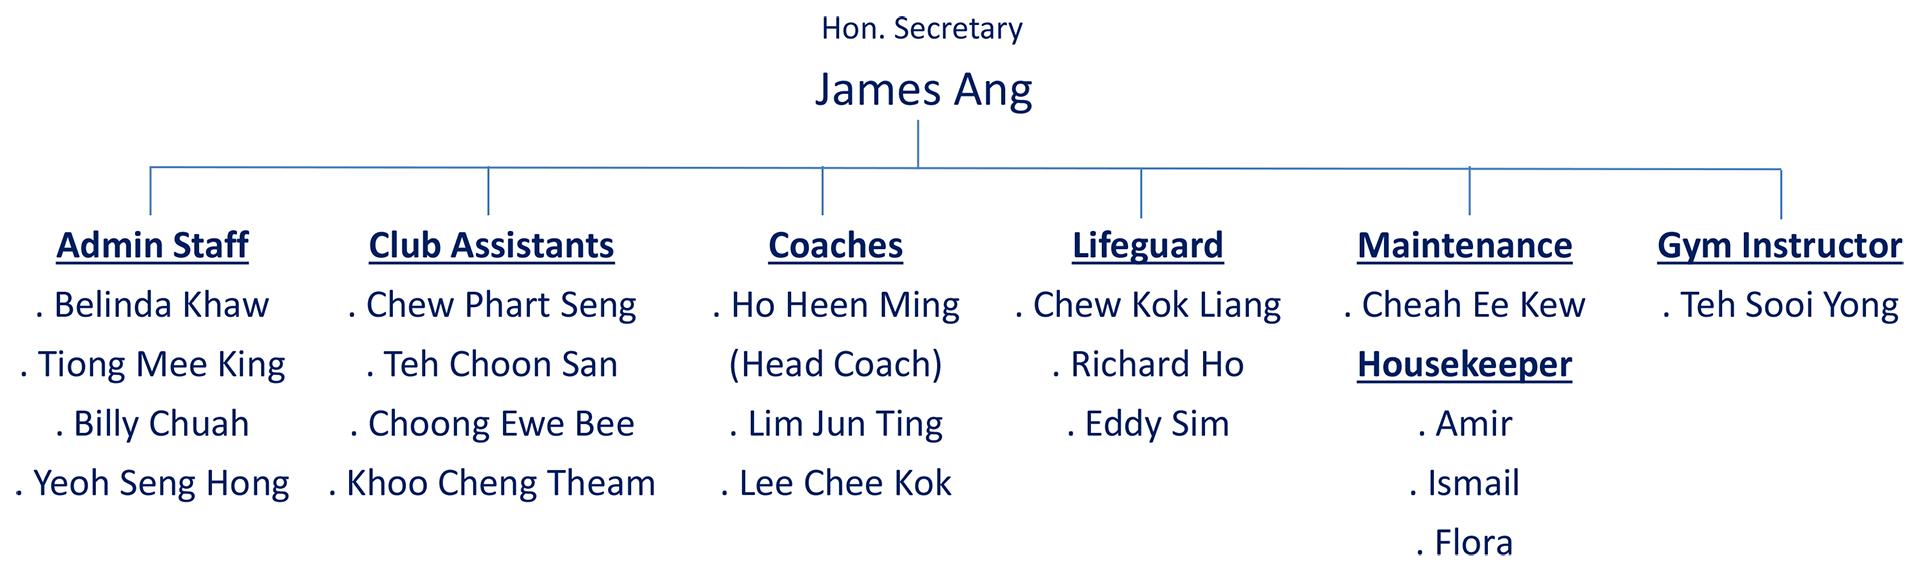 secretary-chart